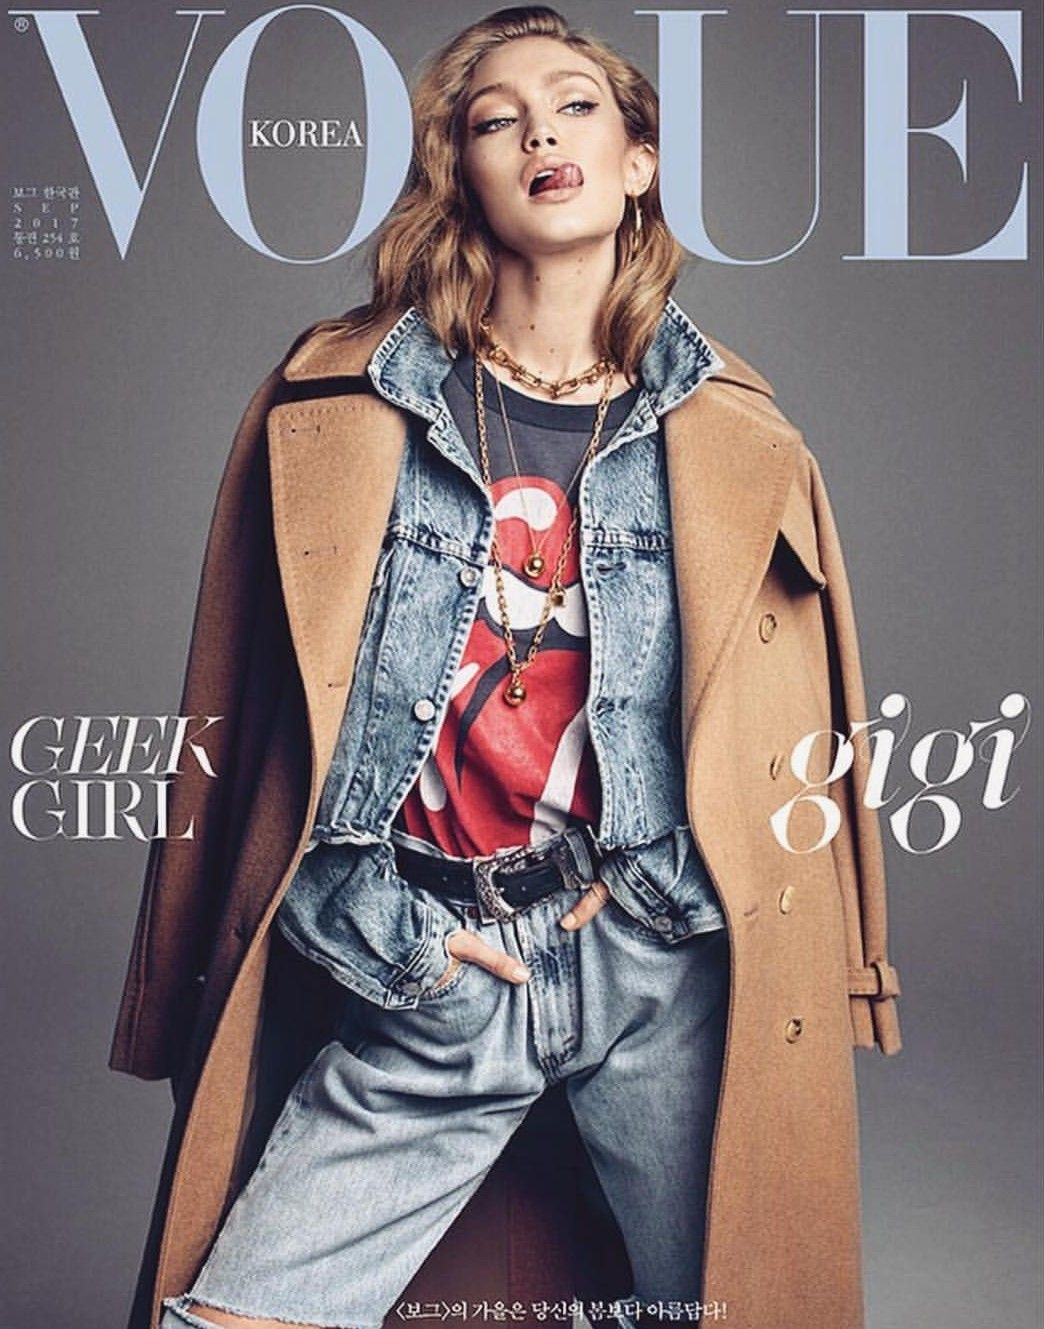 56235e8b Gigi hadid #vogue magazine | Fashion magazines | Gigi vogue, Fashion ...